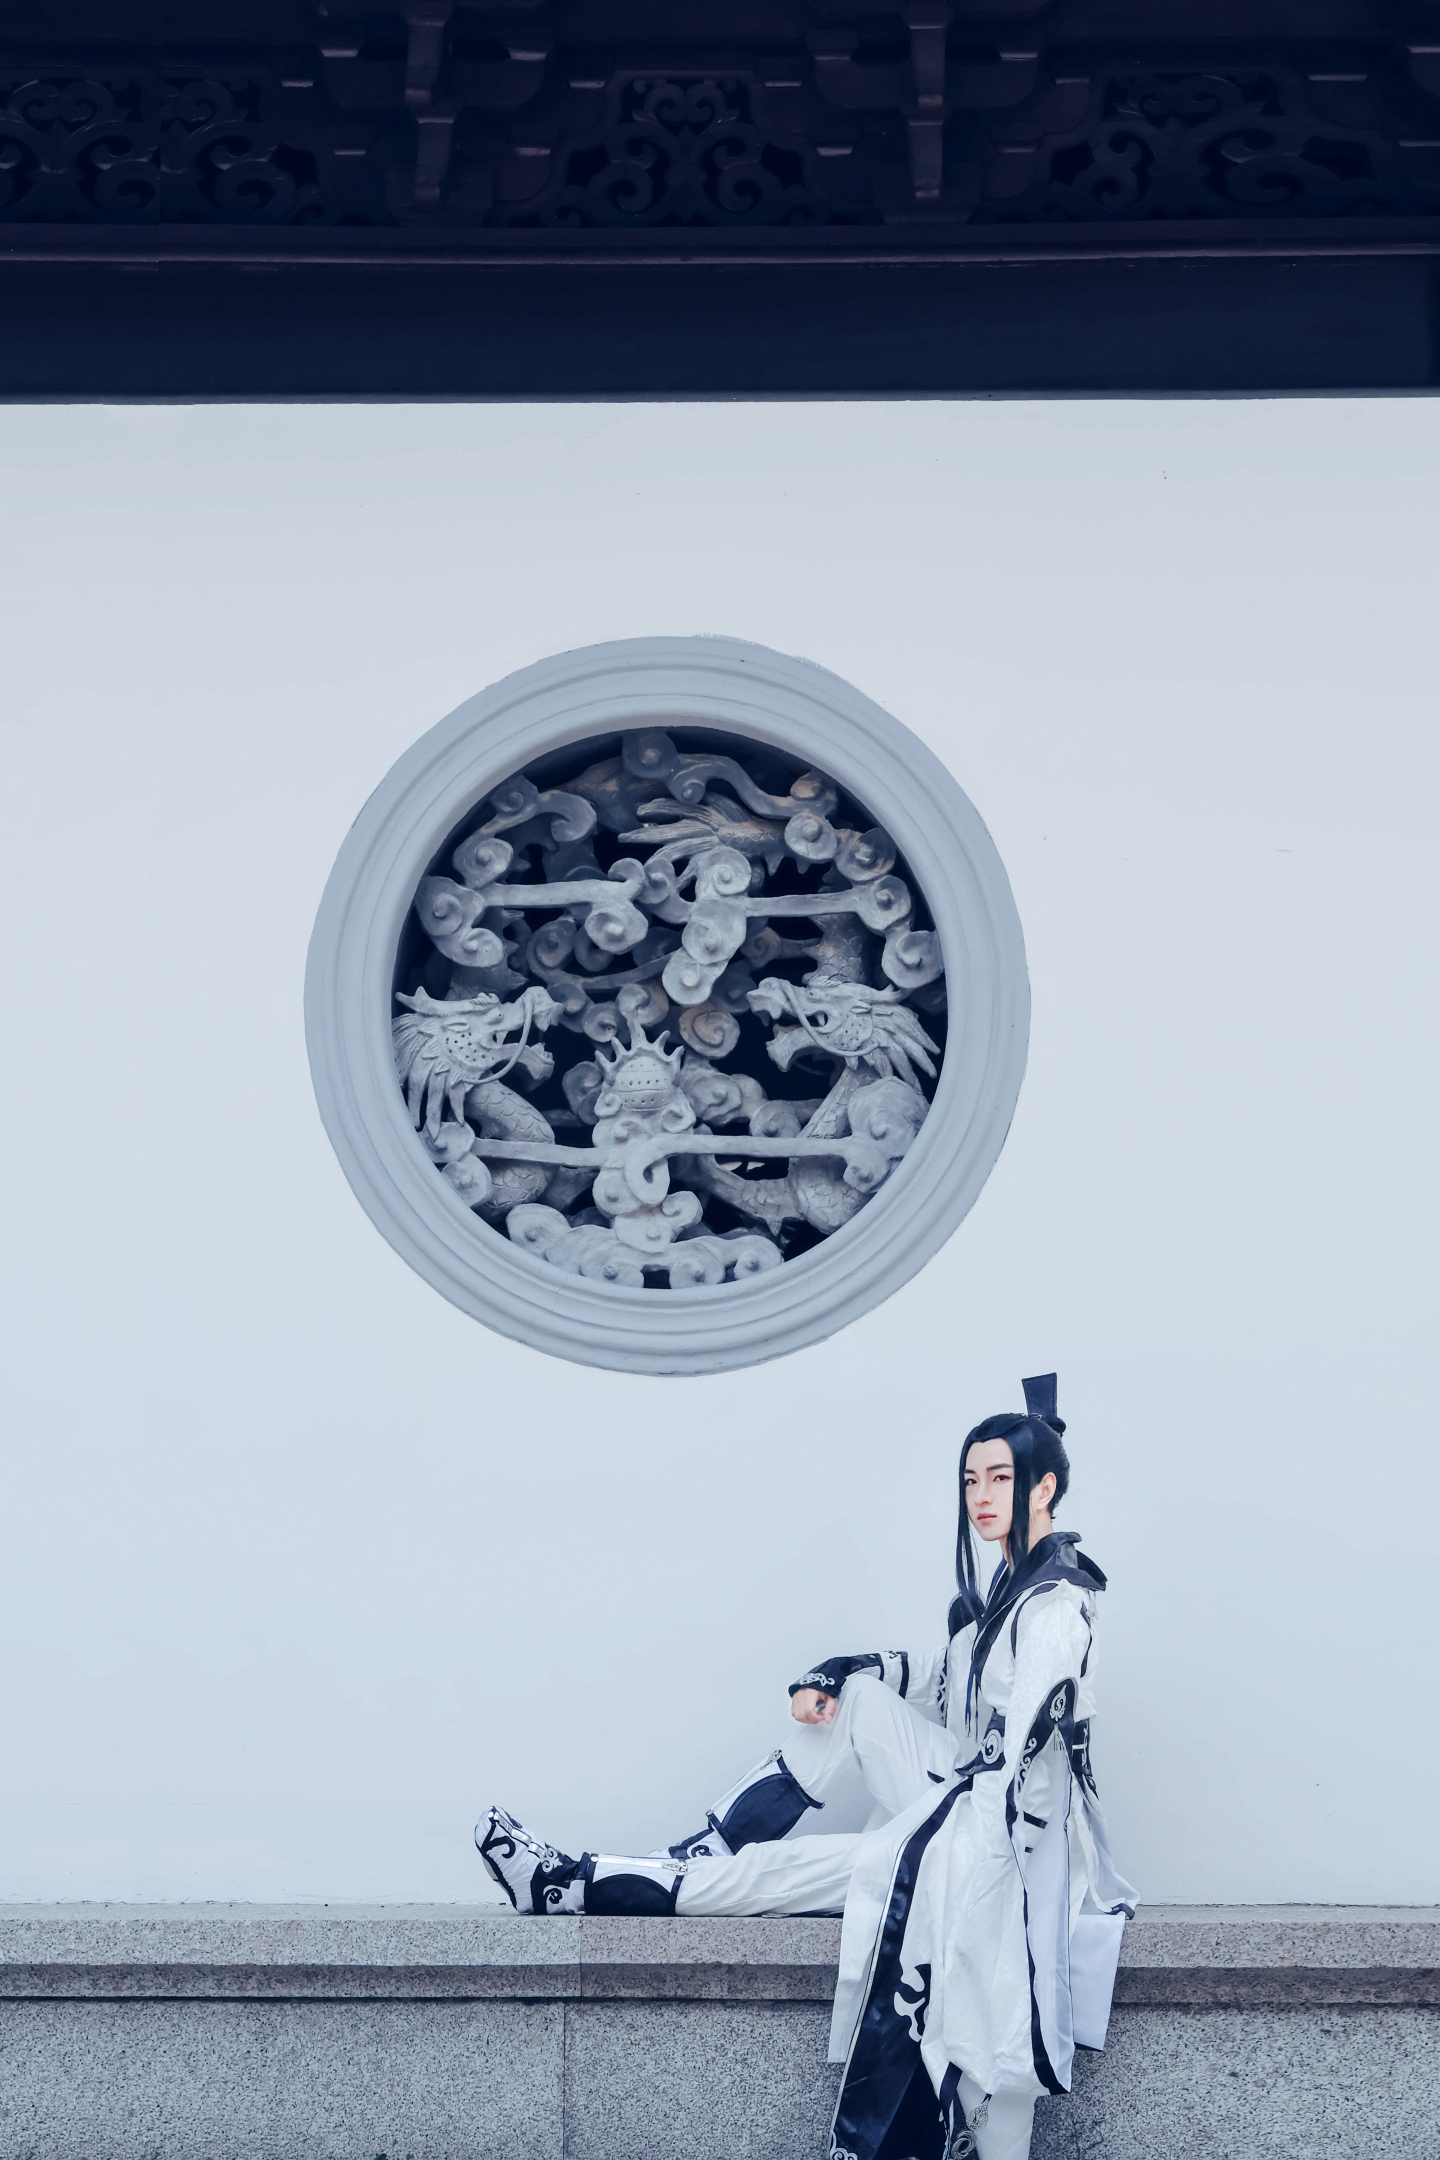 剑网三纯阳cosplay插图(3)